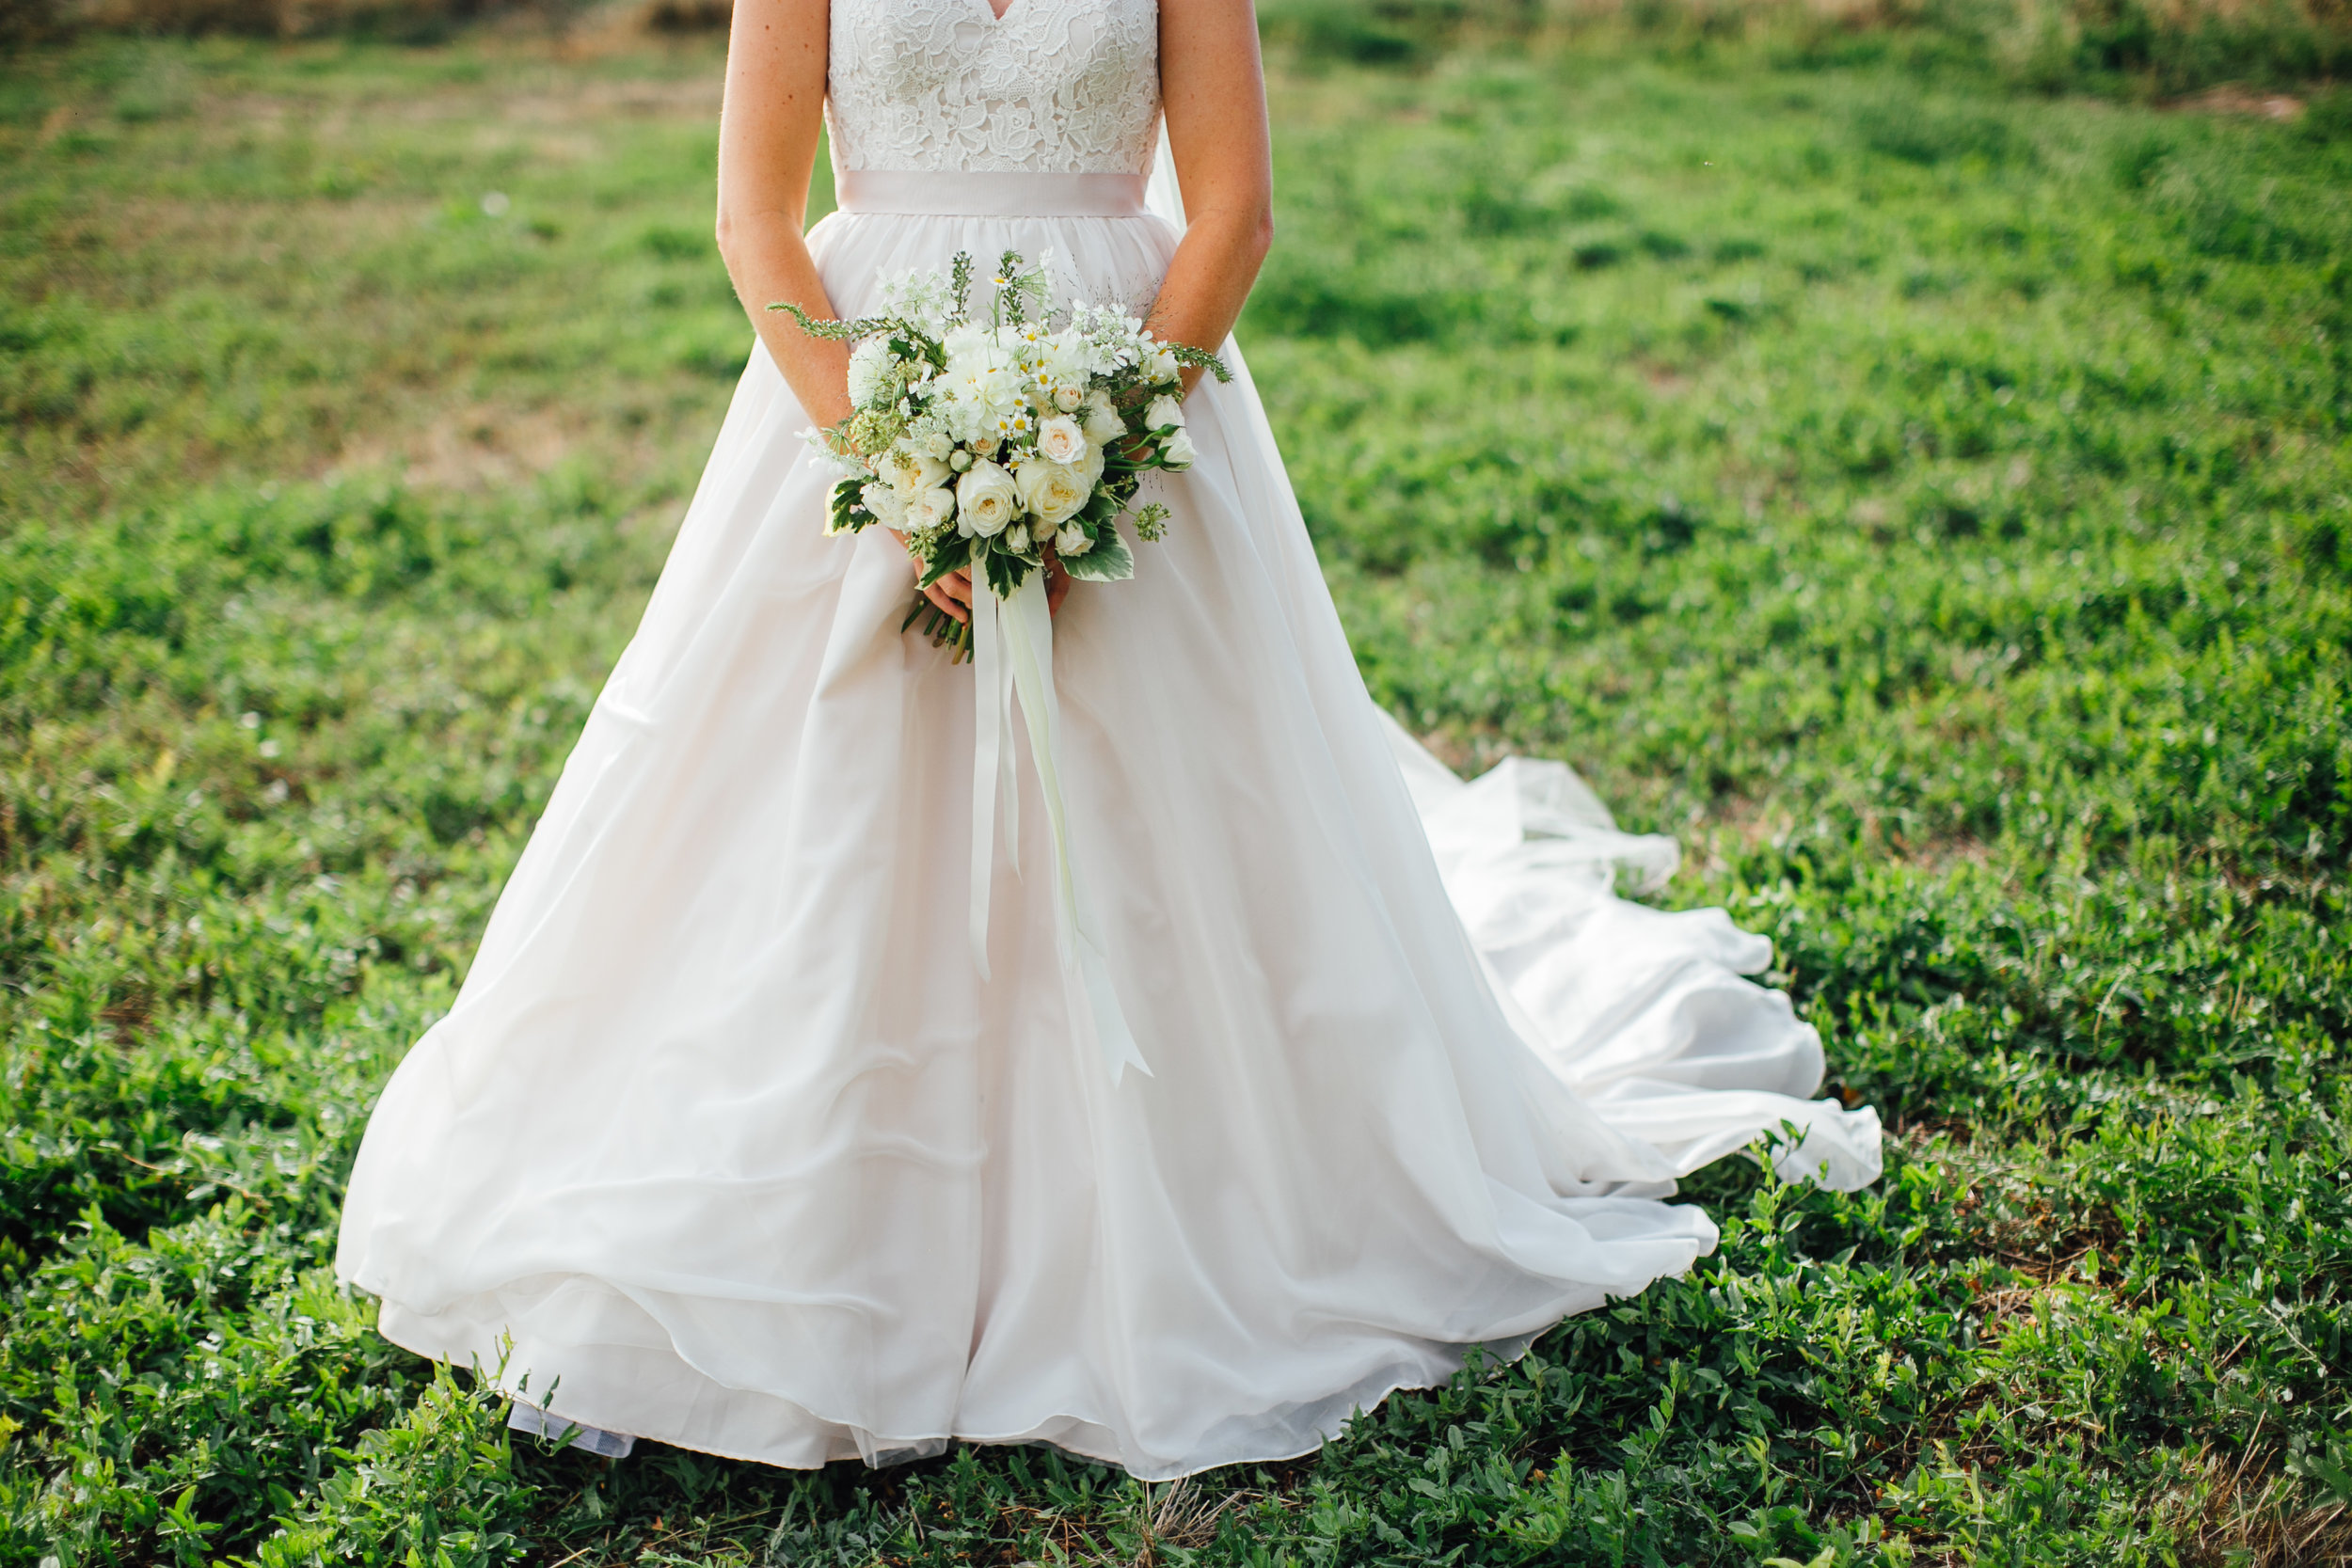 Bride Alone with White Wedding Bouquet  Little Thompson Valley Pioneer Museum Berthoud Colorado Wedding